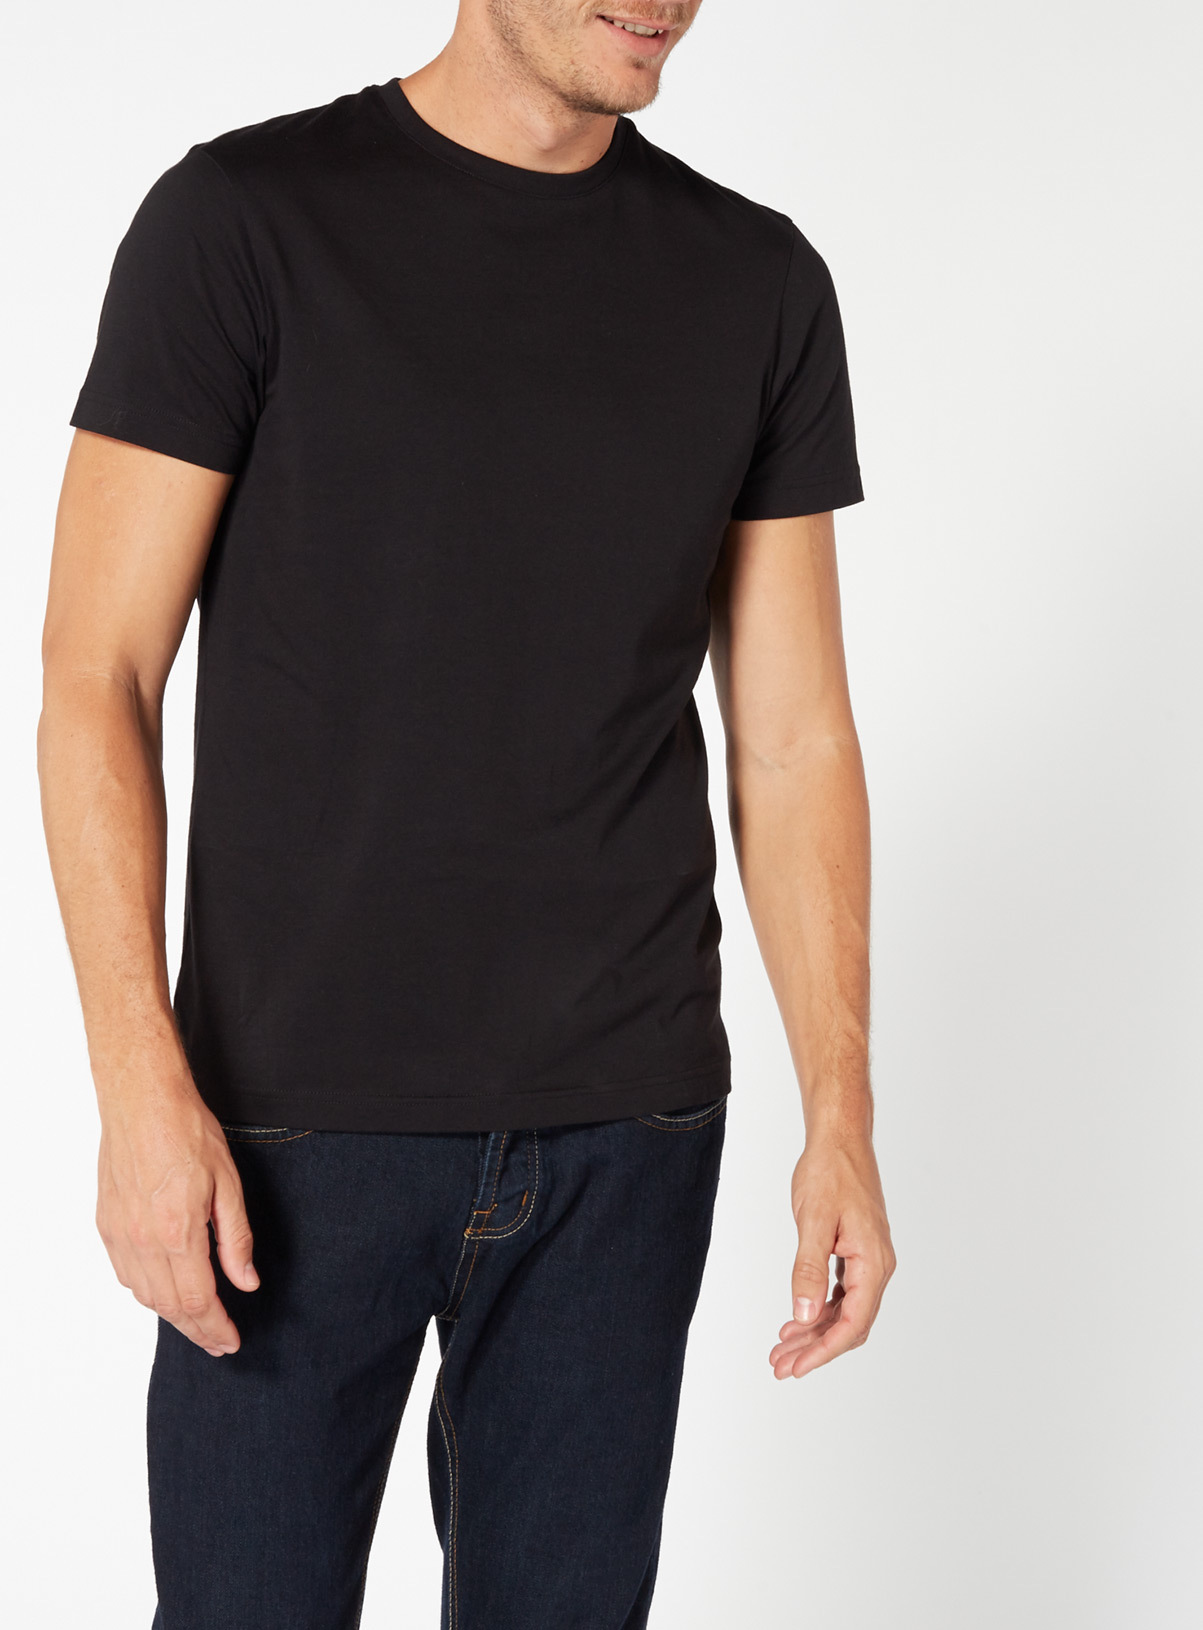 Mens Black Crew Neck T-Shirt | Tu clothing